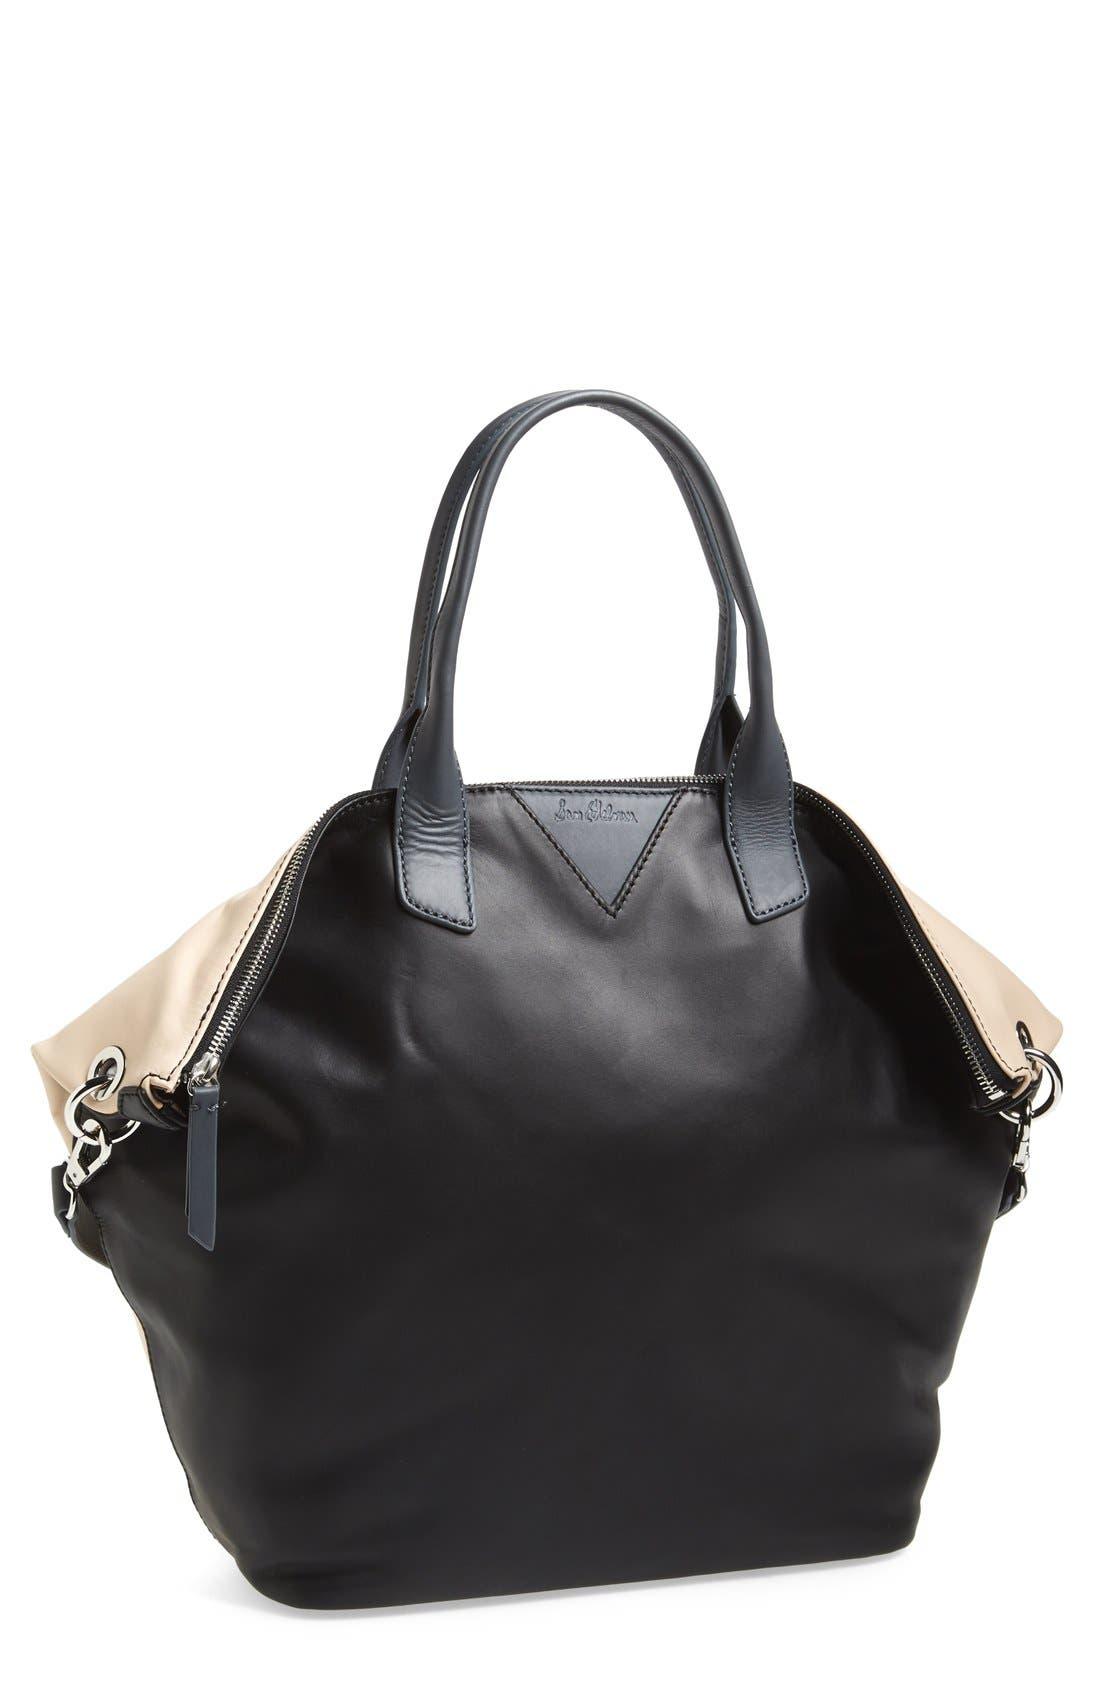 Main Image - Sam Edelman 'Sharp Graphic' Leather Satchel